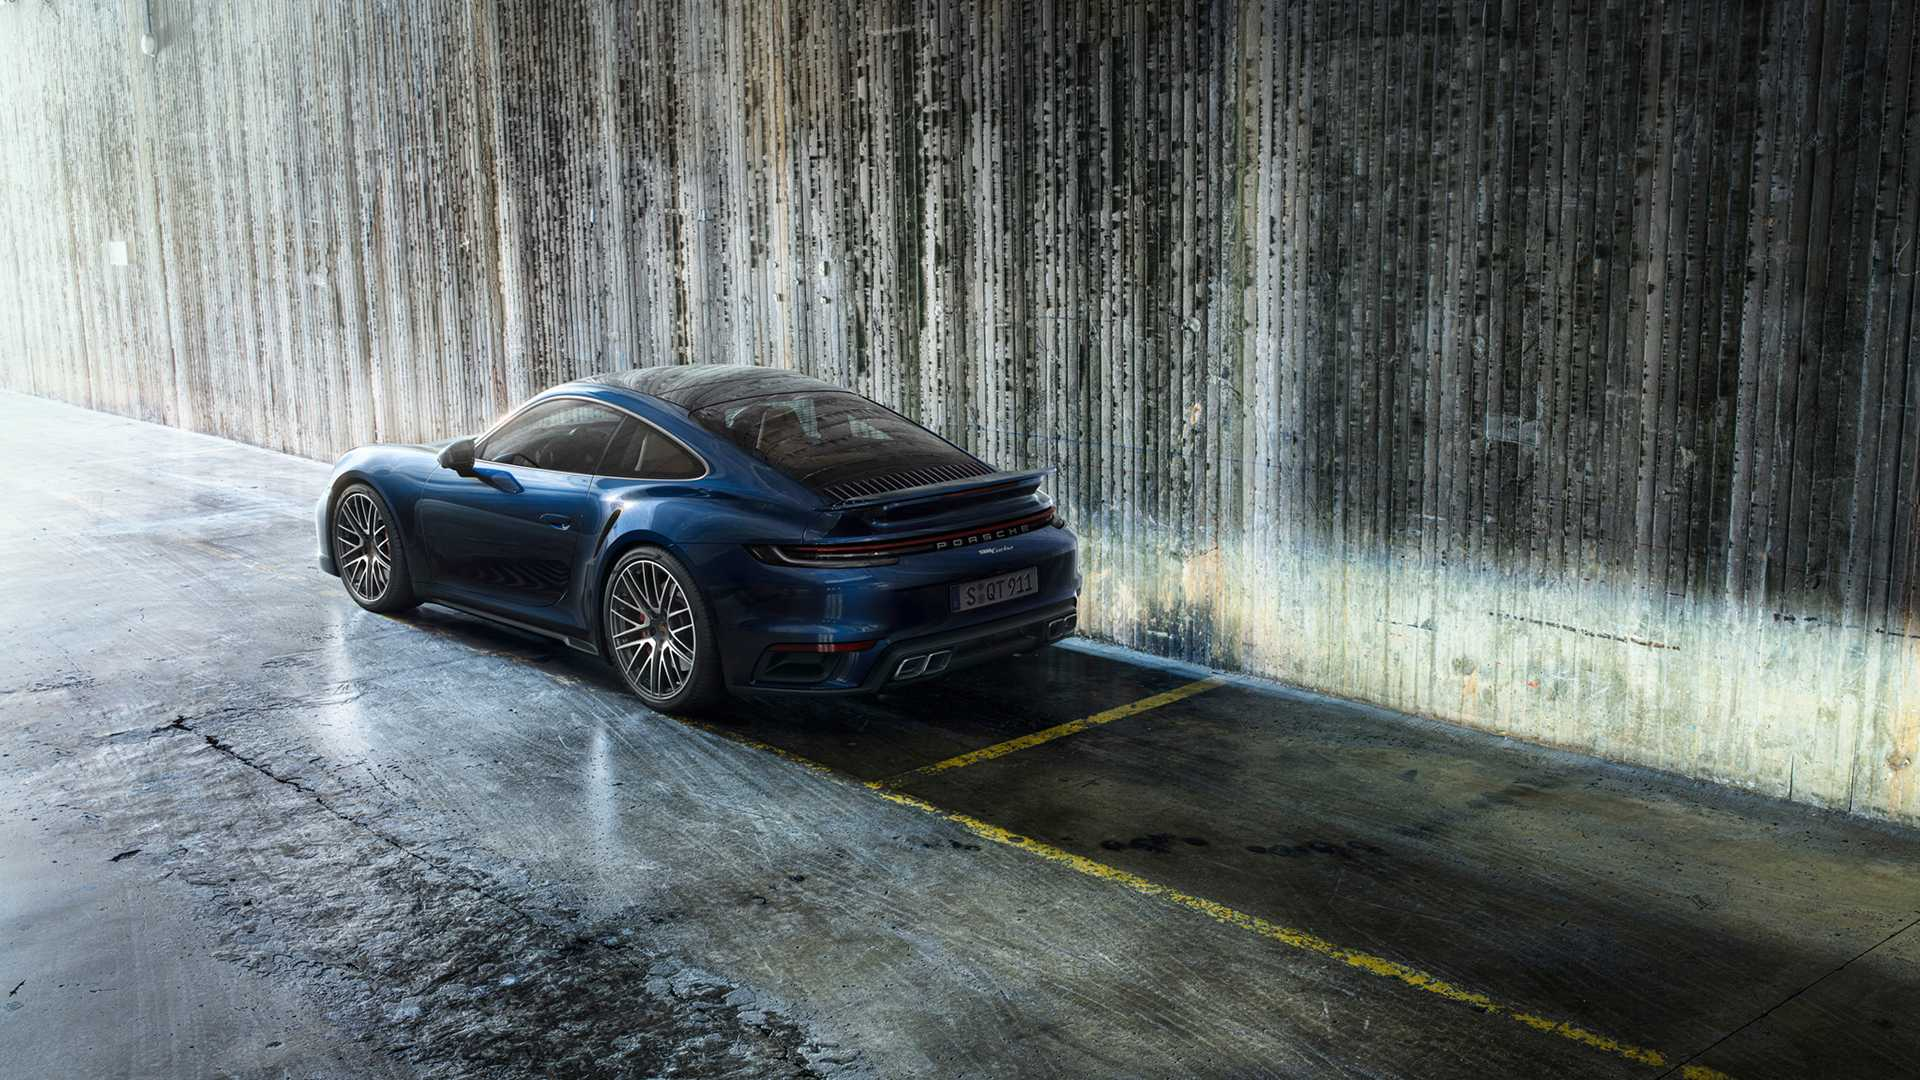 2021-porsche-911-turbo-coupe (2)